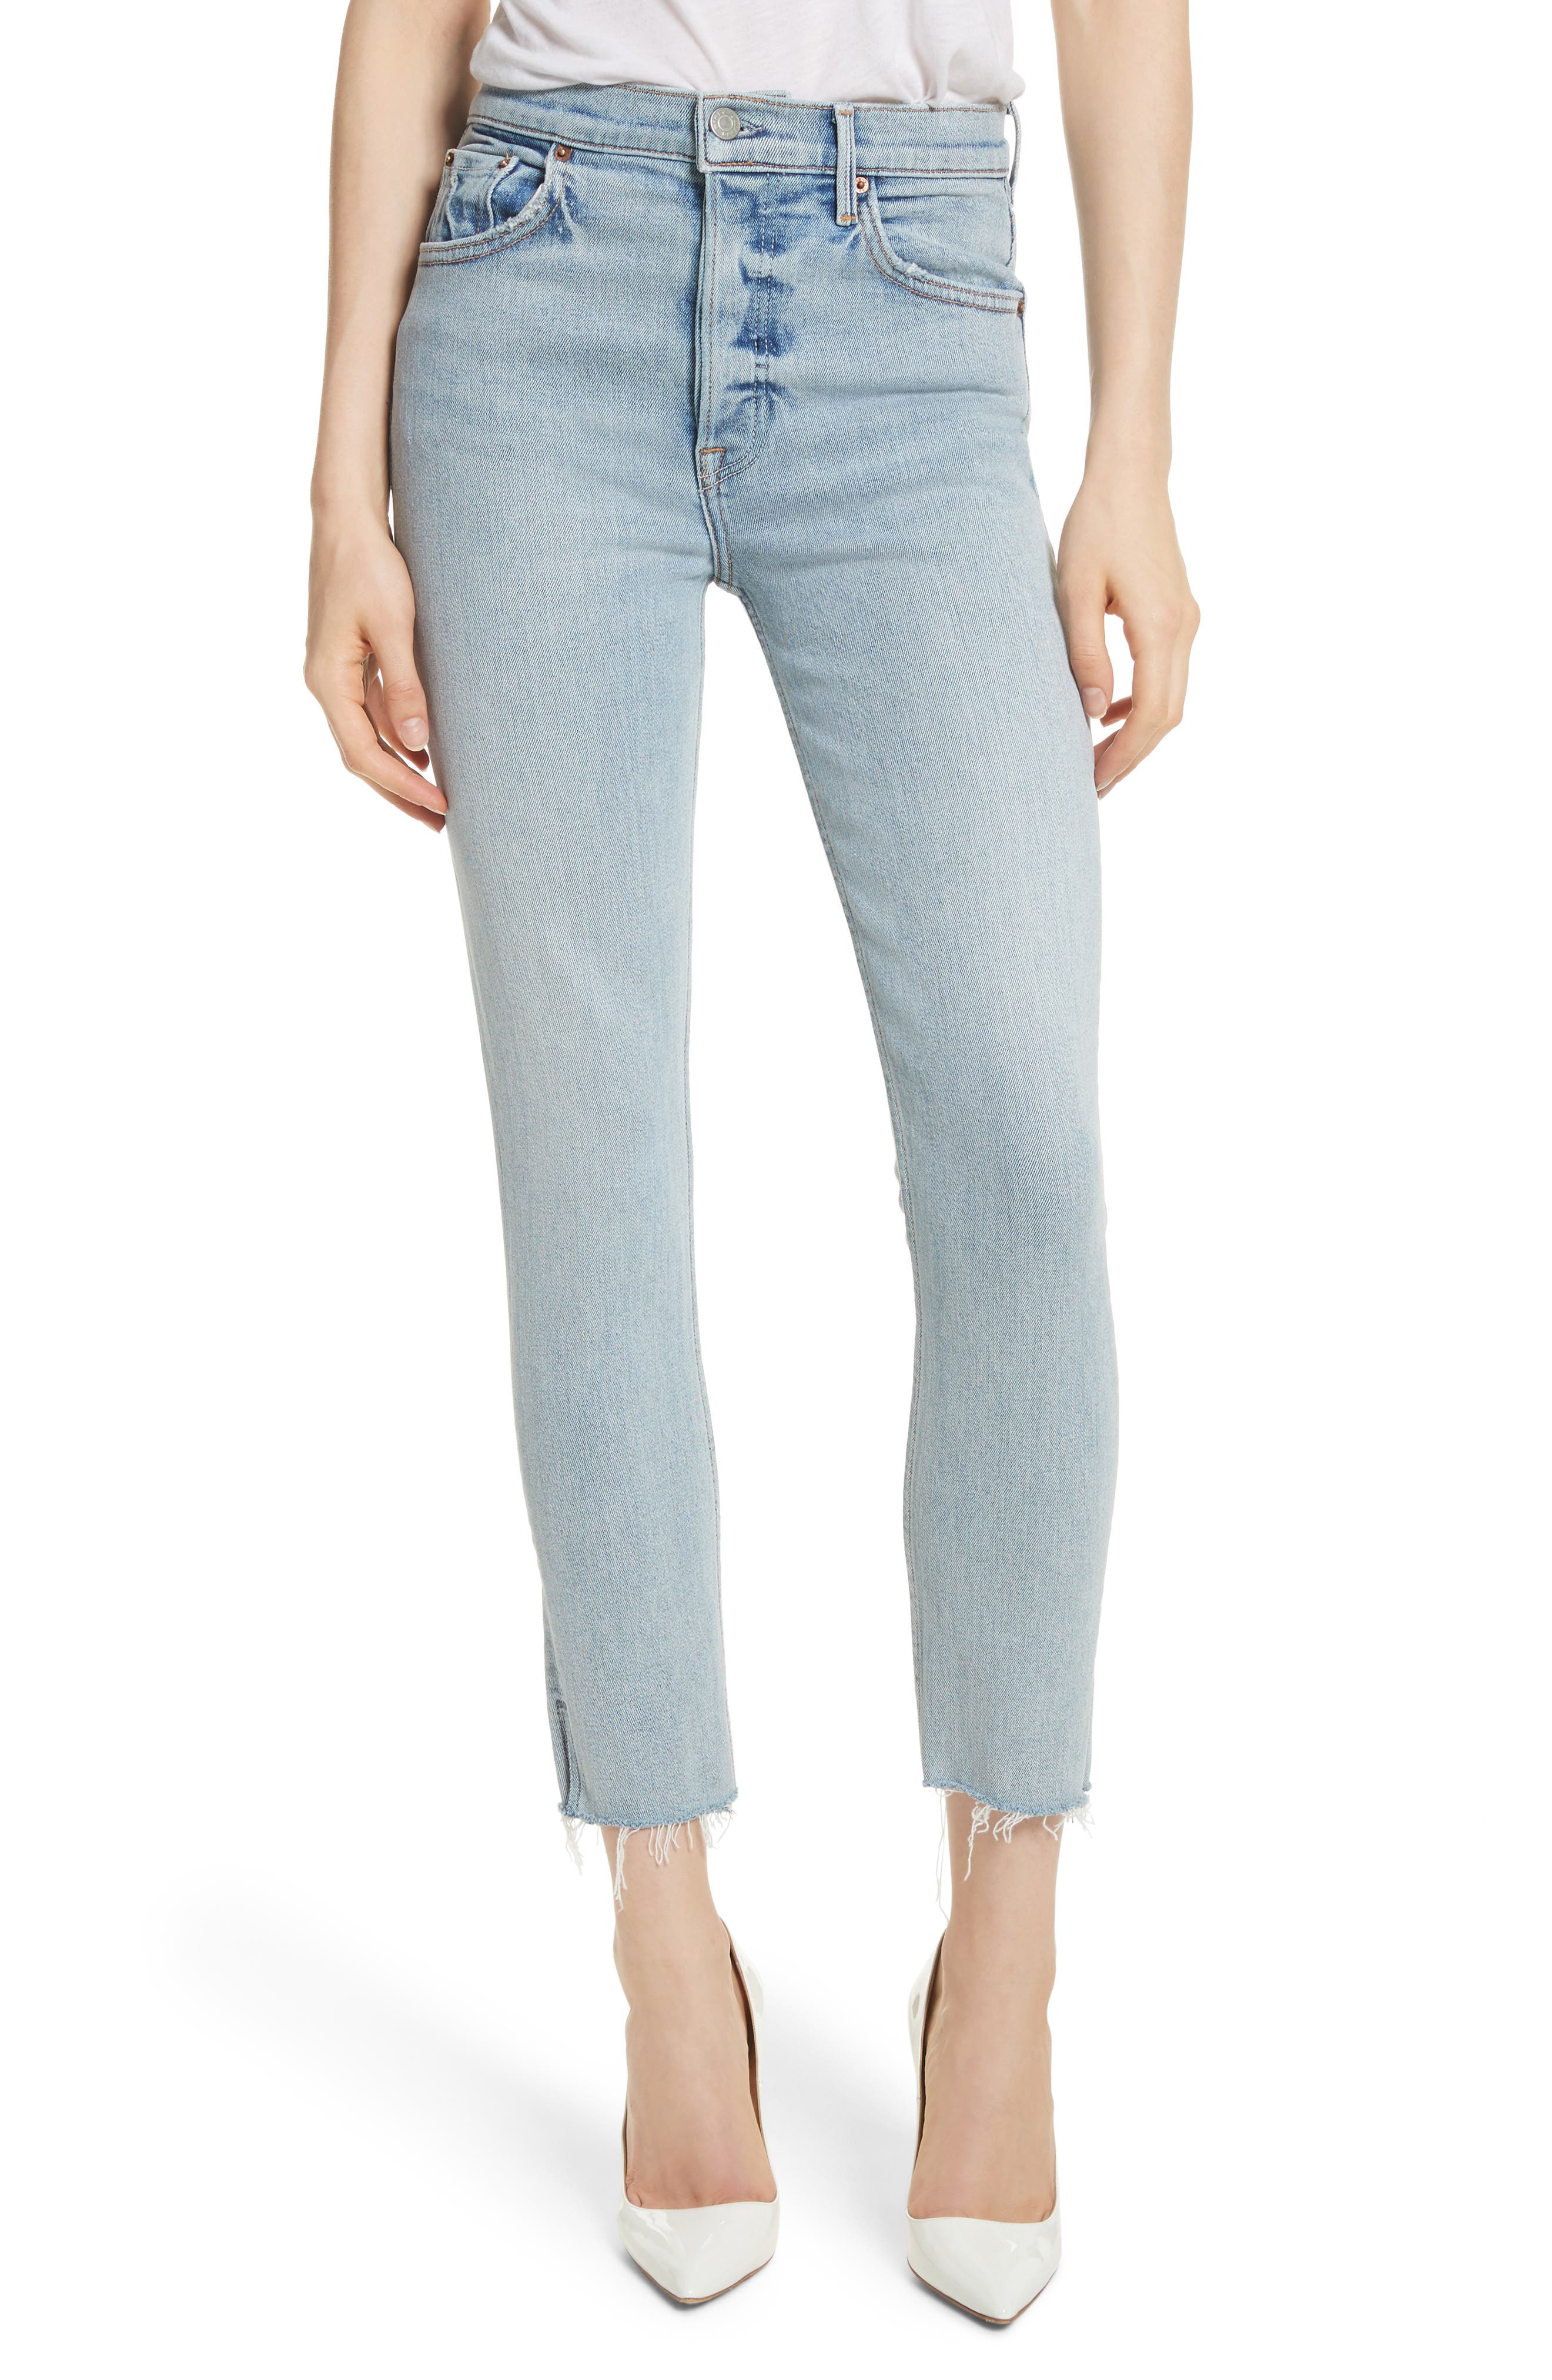 Karolina High Waist Skinny Jeans,                             Main thumbnail 1, color,                             TITANIUM